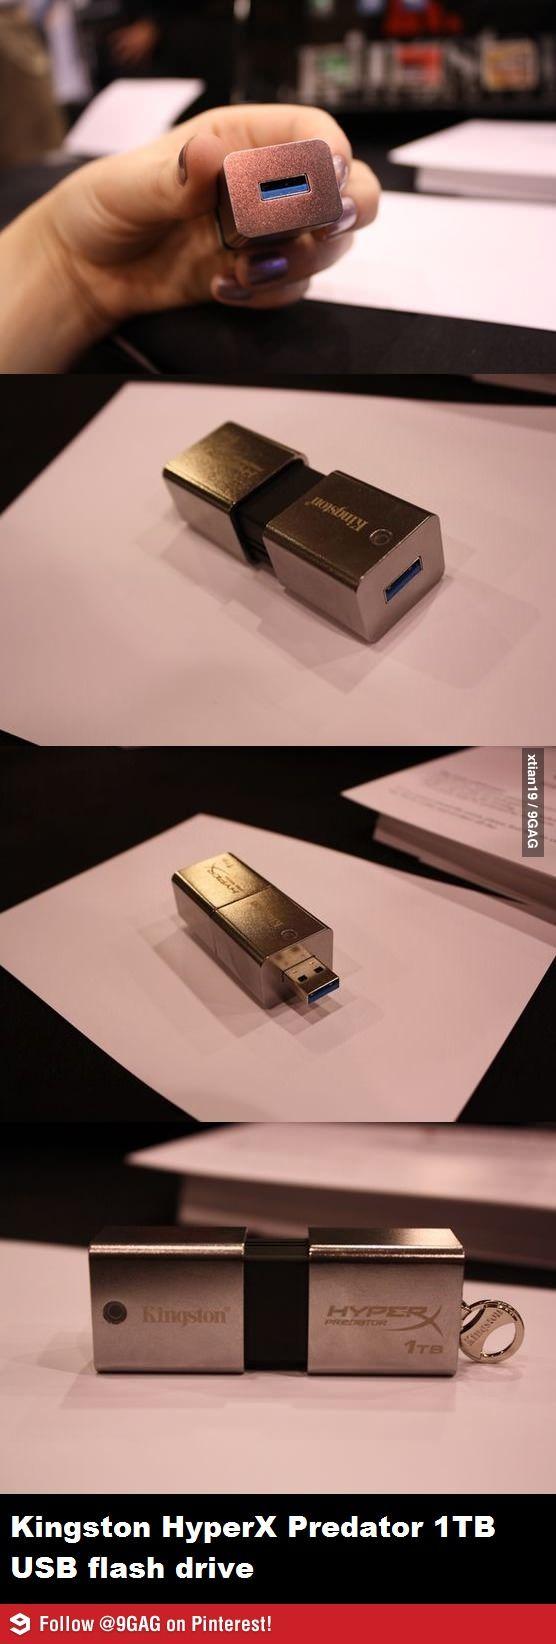 1 terabyte usb stick i want technology gadgets geek. Black Bedroom Furniture Sets. Home Design Ideas